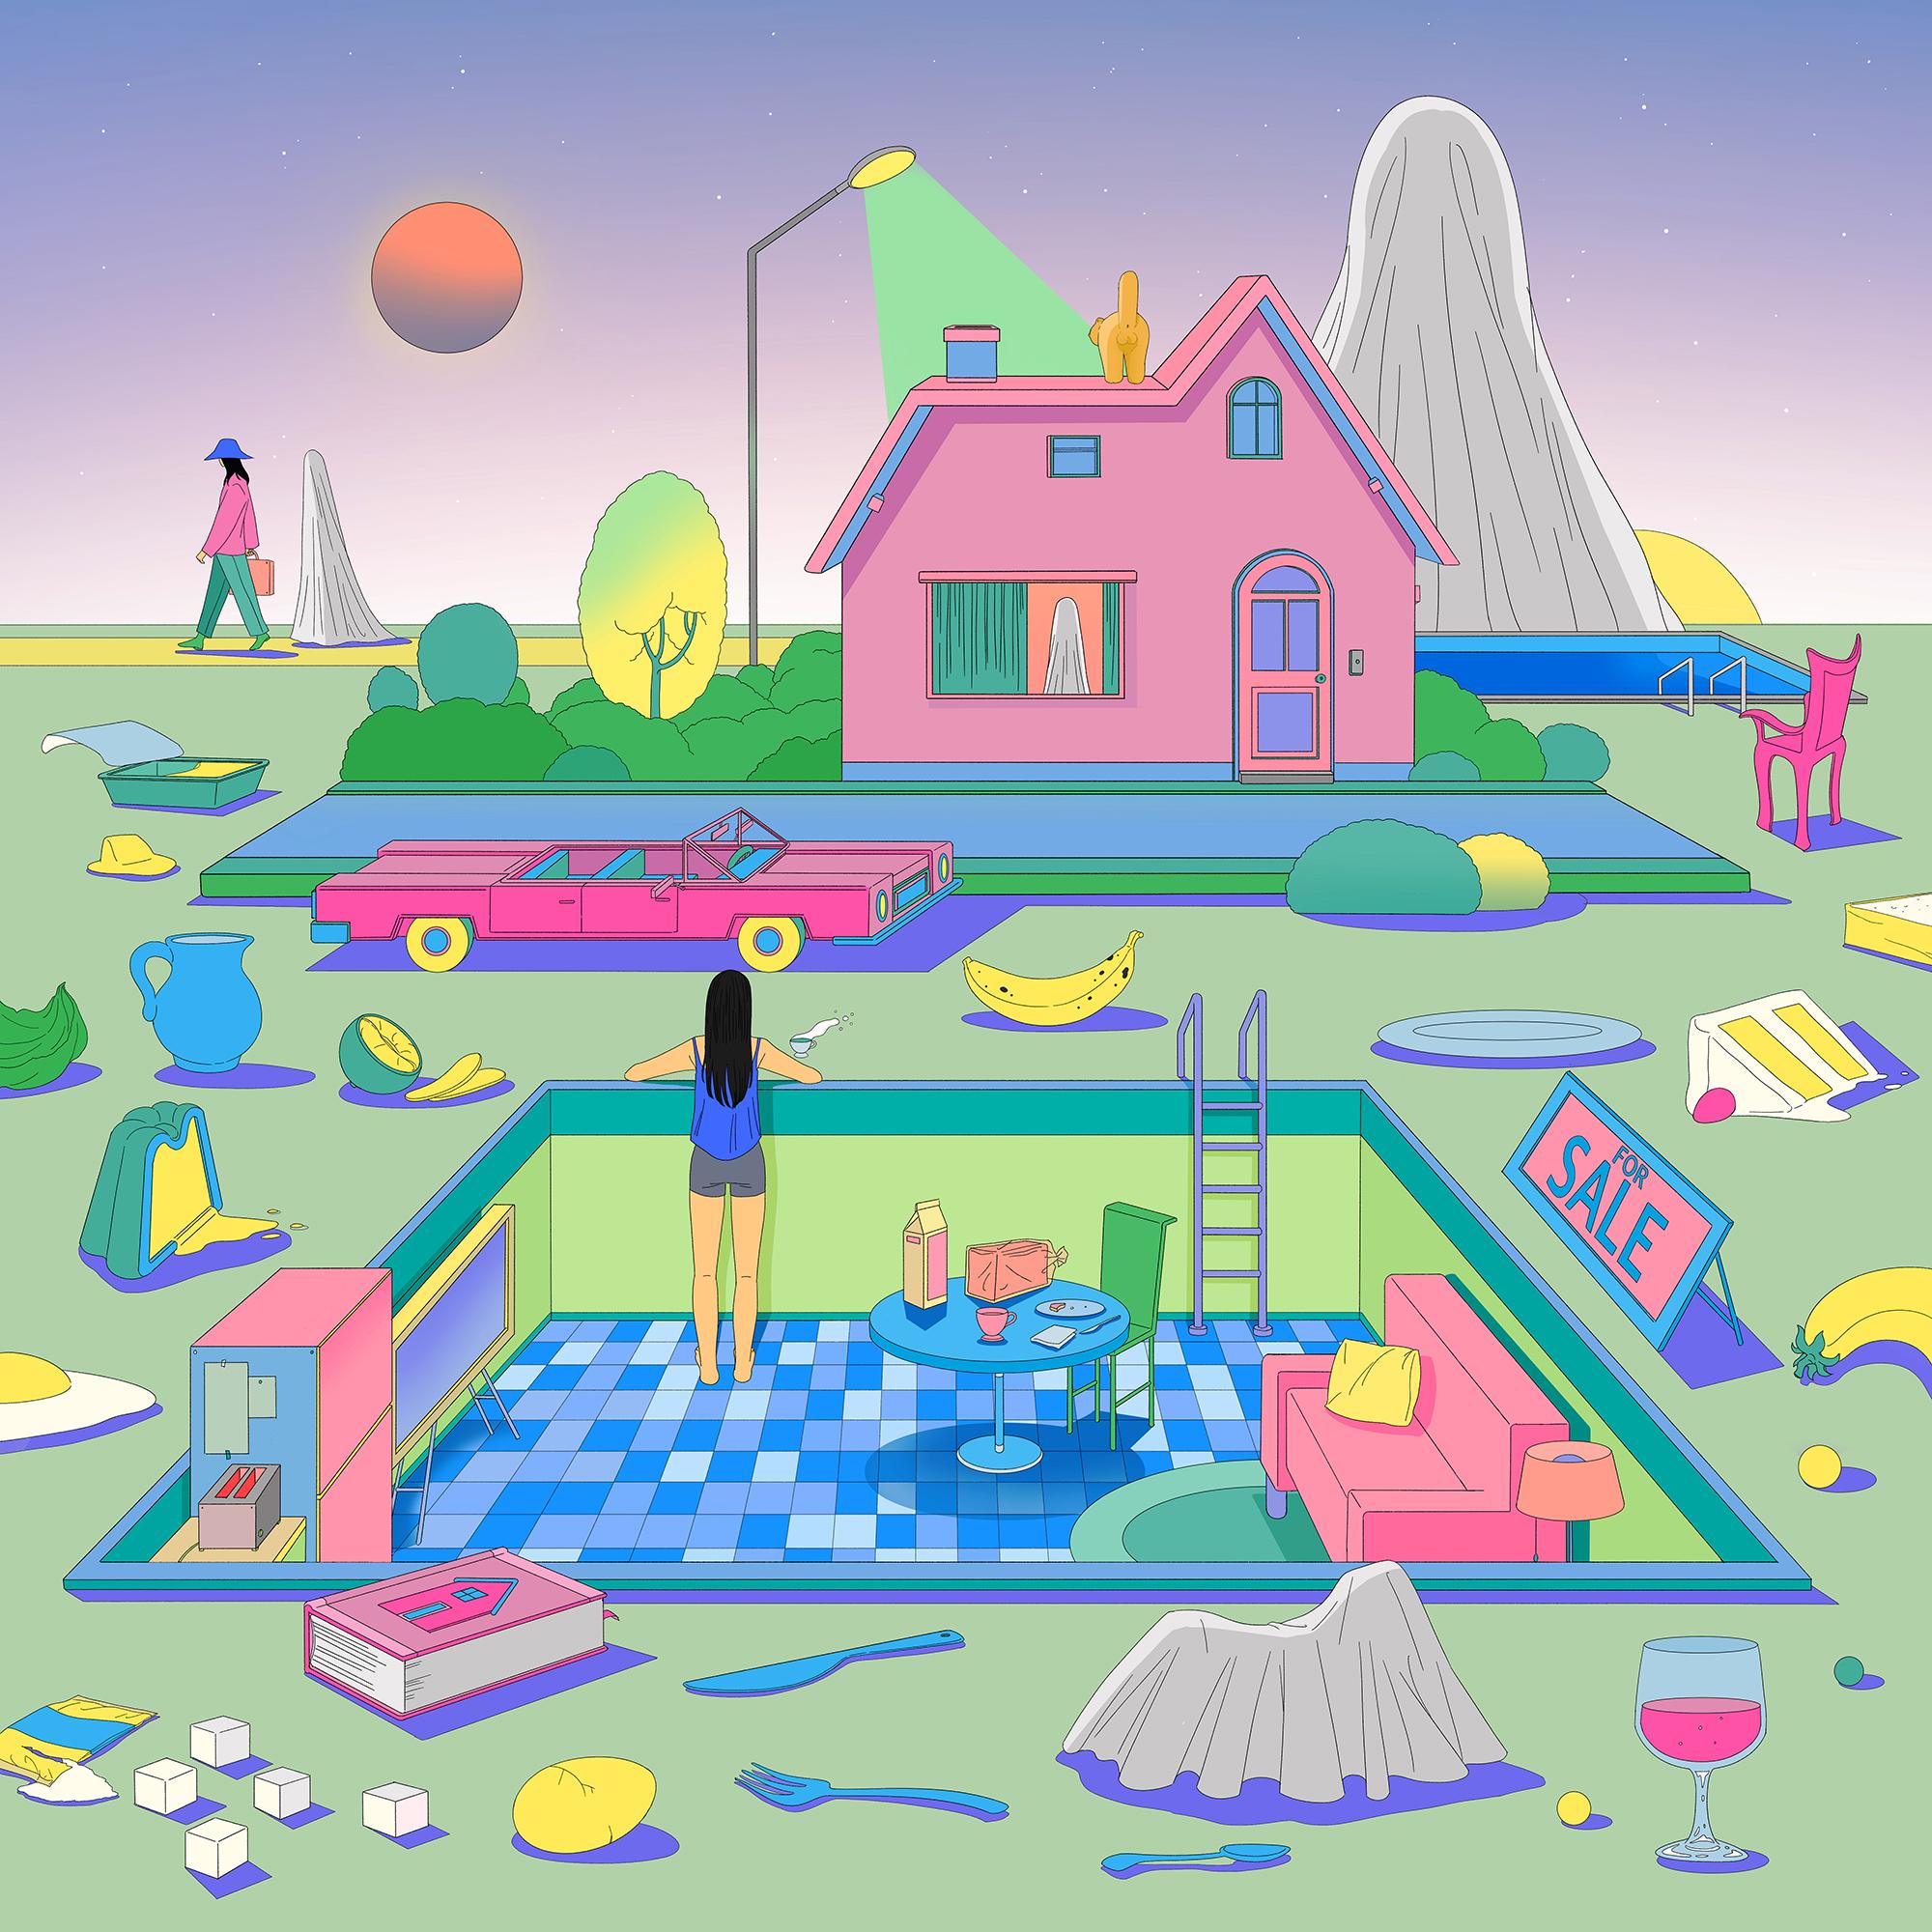 GirlsclubAsia-Illustrator-Seoyoung-tototatatu-1